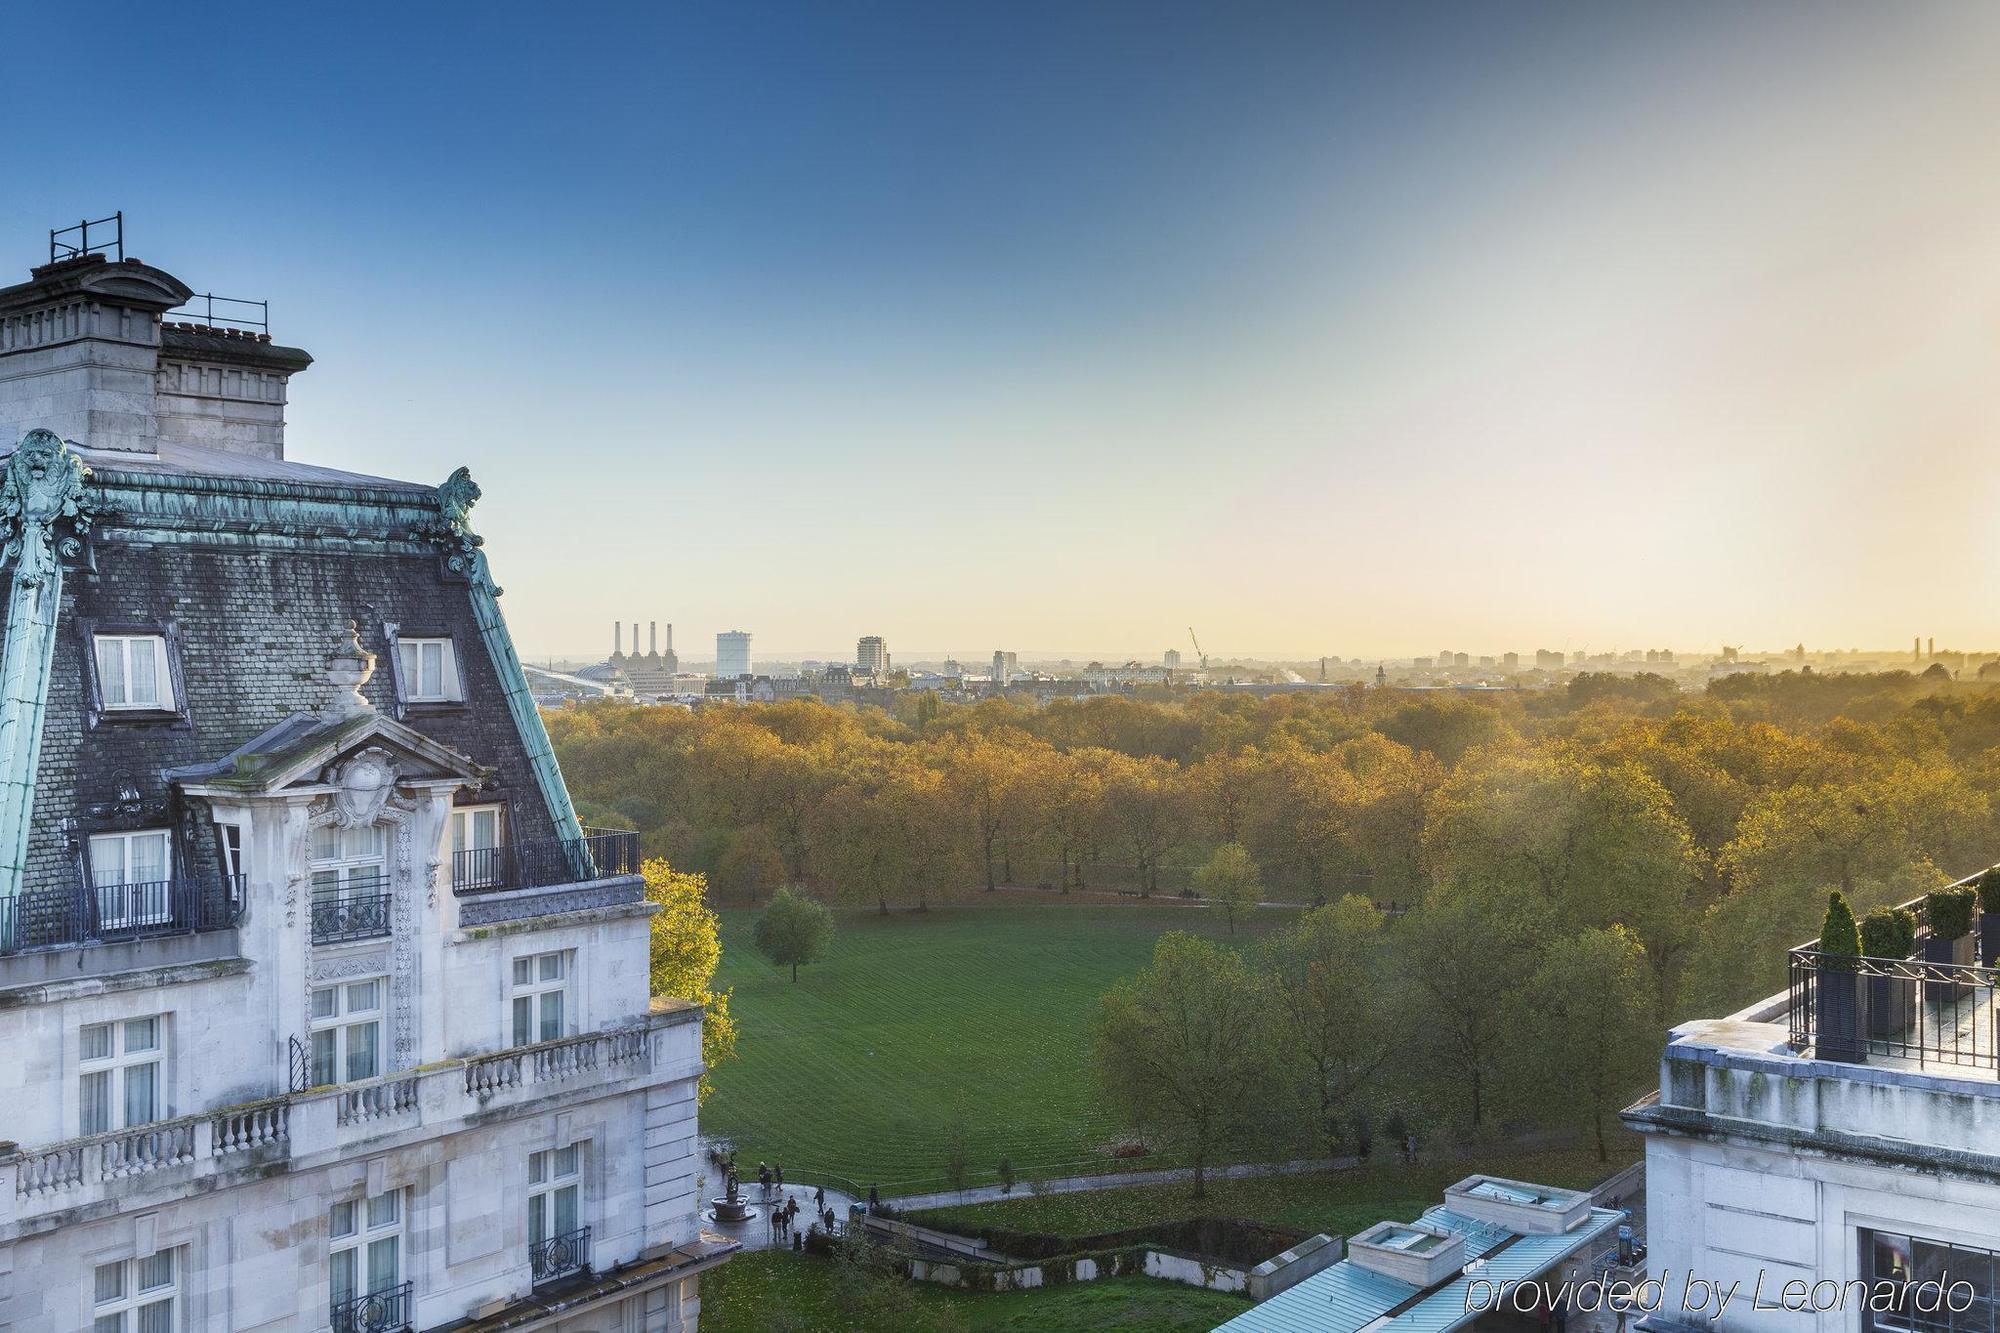 United Kingdom Luxury Destination Guide - Sofitel Hotel